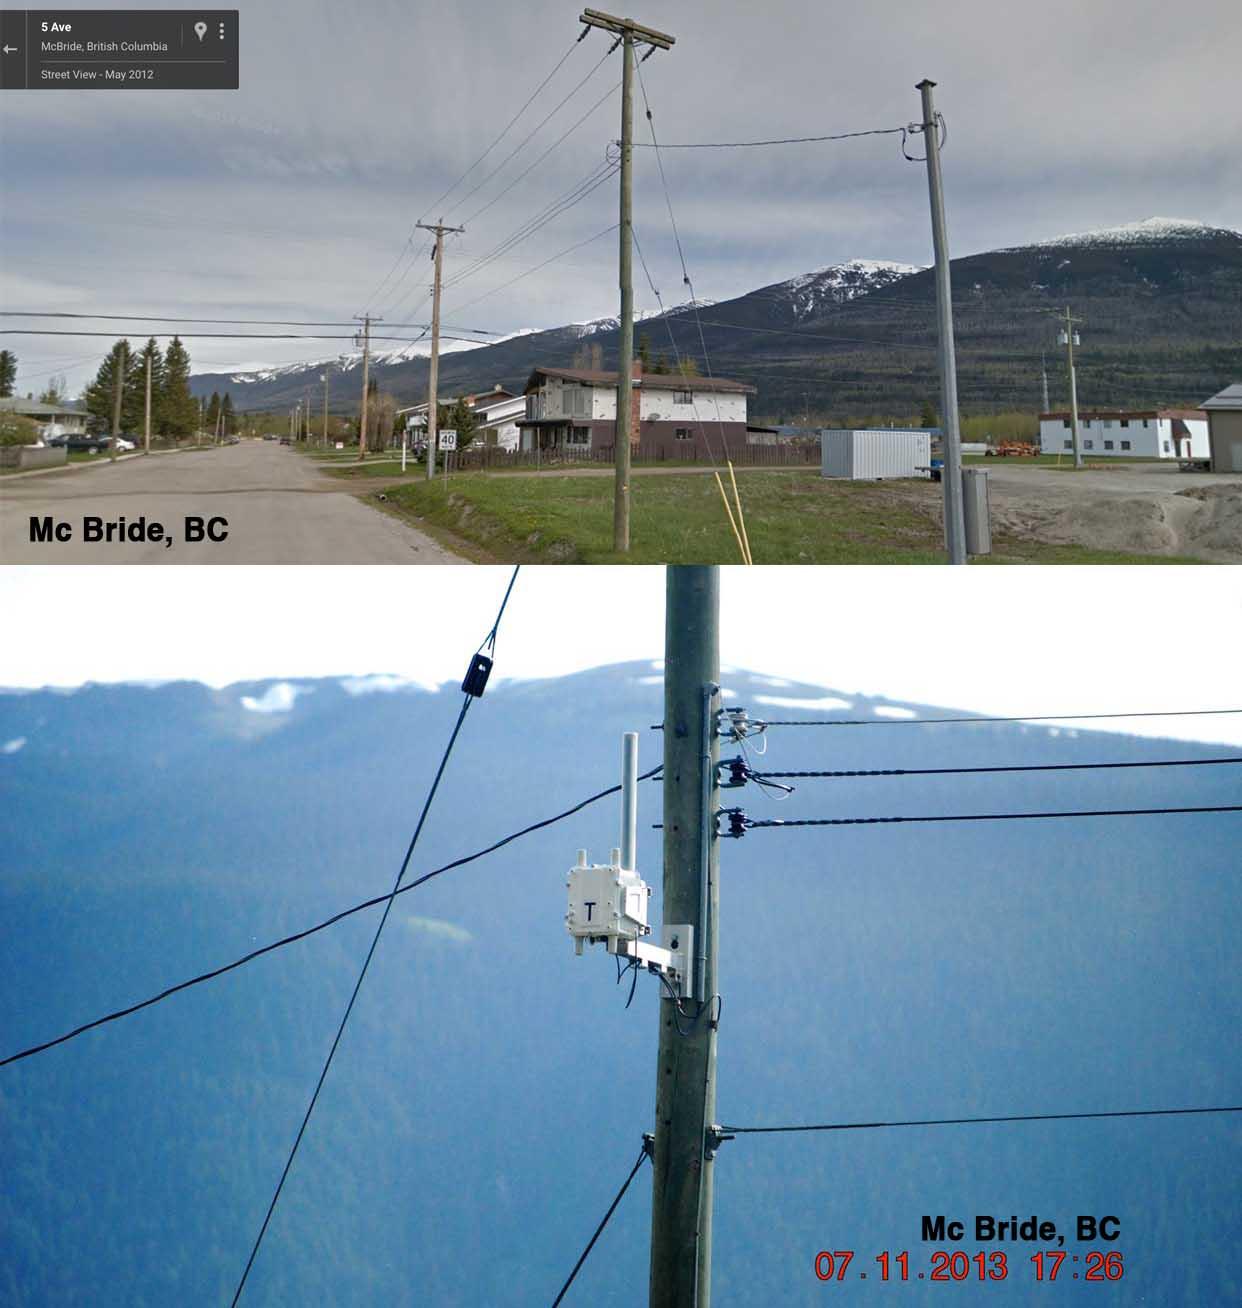 499 Main St. McBride   - BC Hydro Collector Router (Cisco Mesh Network)